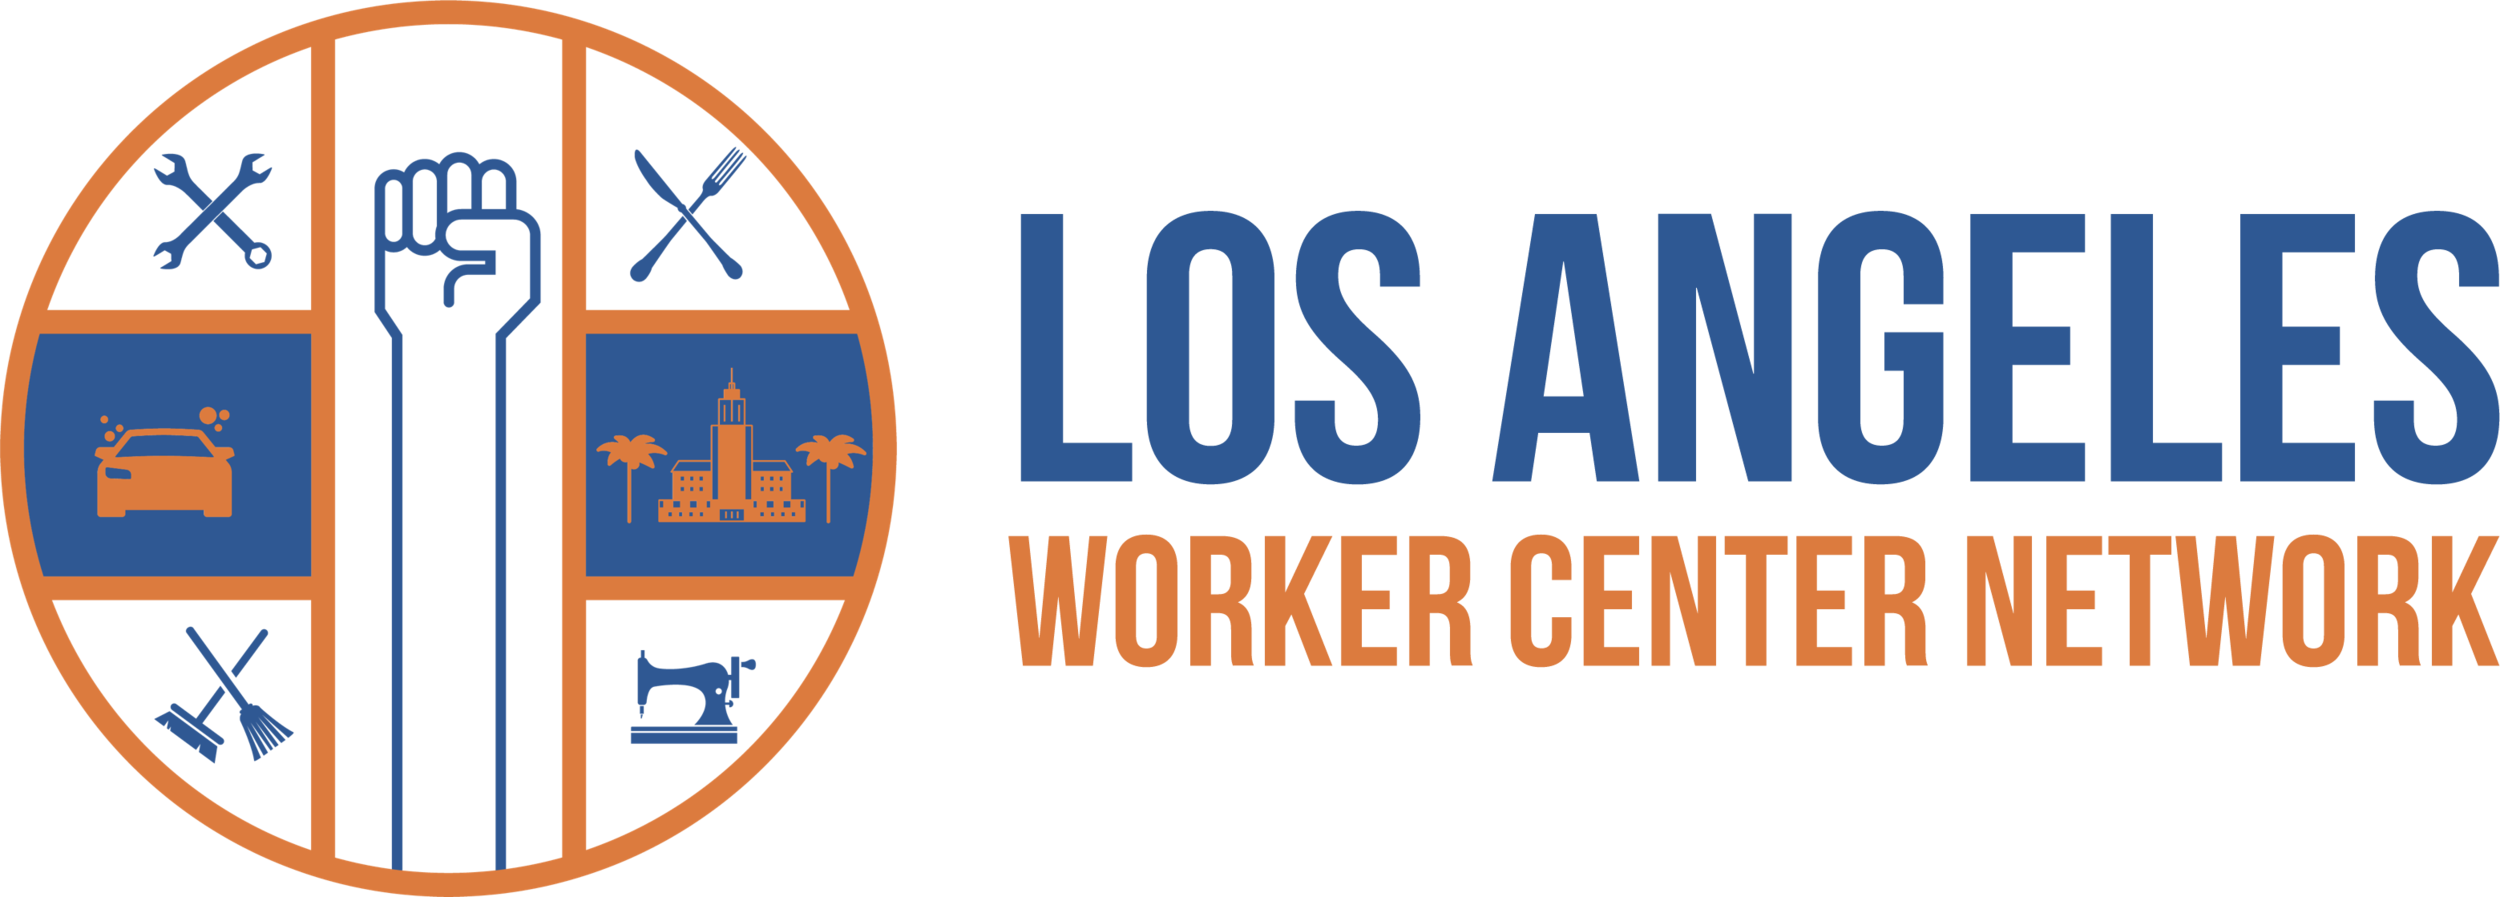 LA workers alliance logo.png